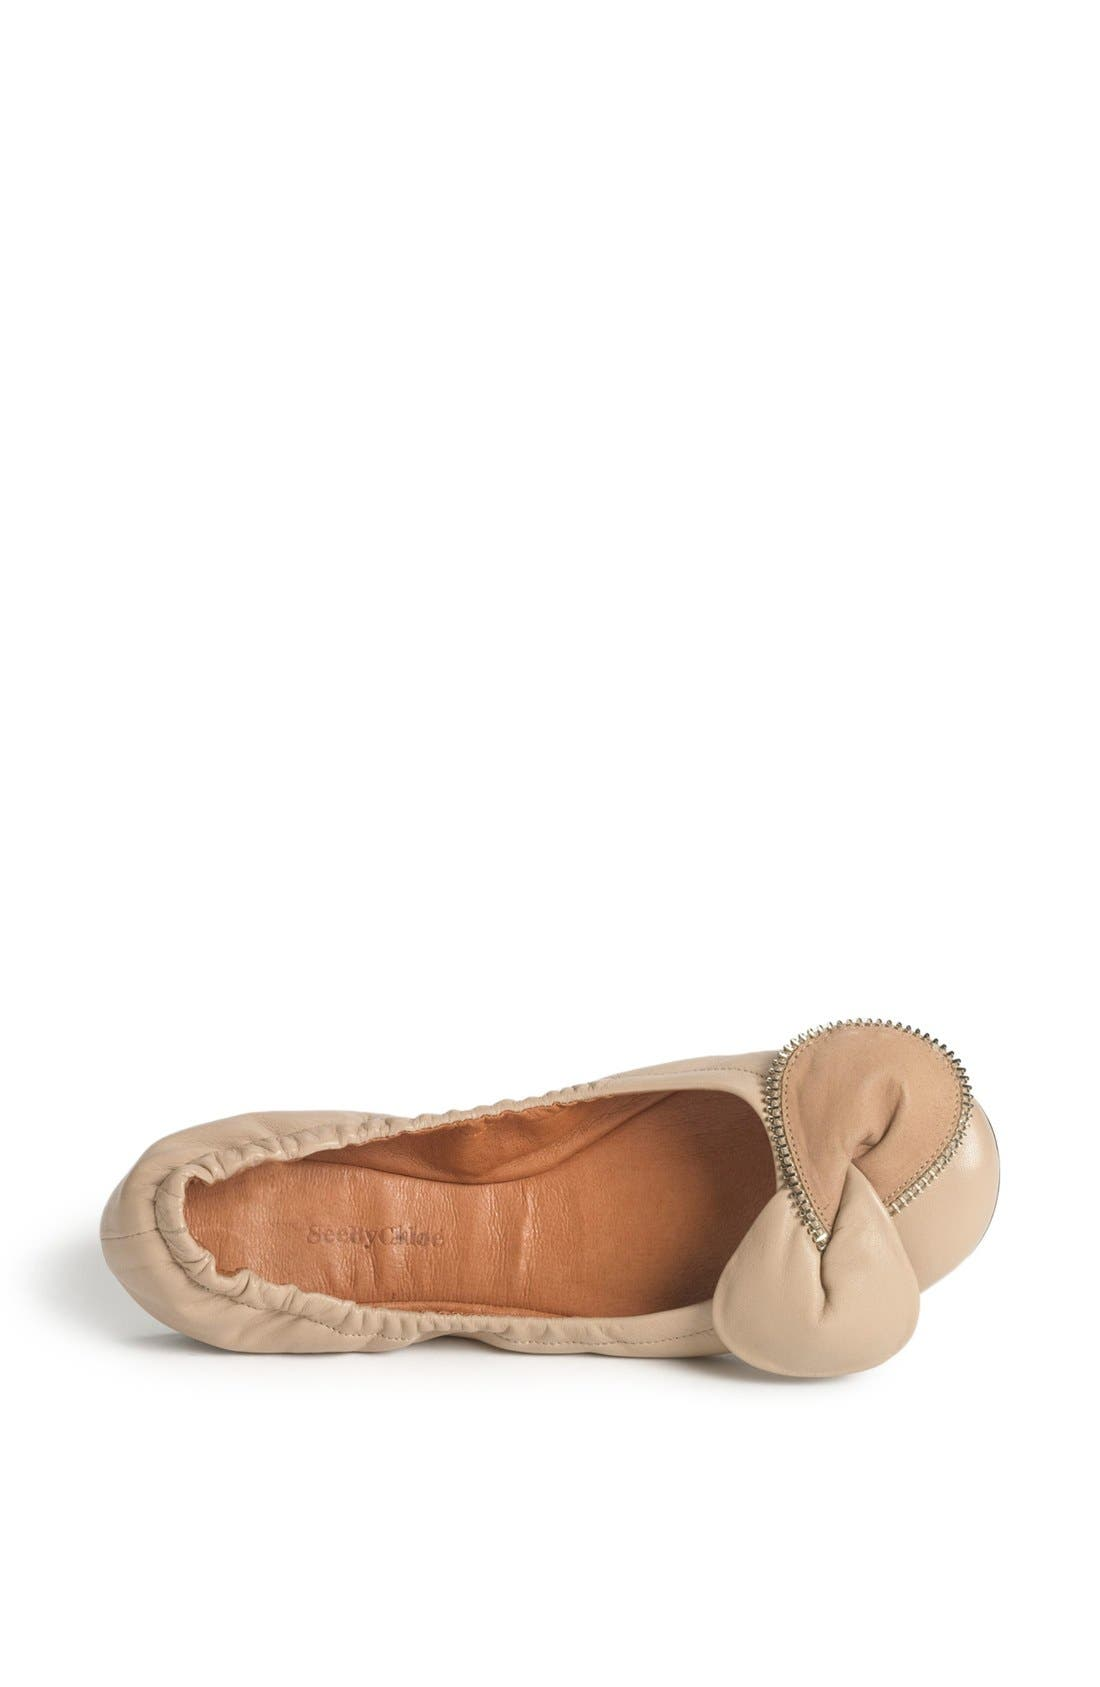 Alternate Image 3  - See by Chloé 'Clara' Ballerina Flat